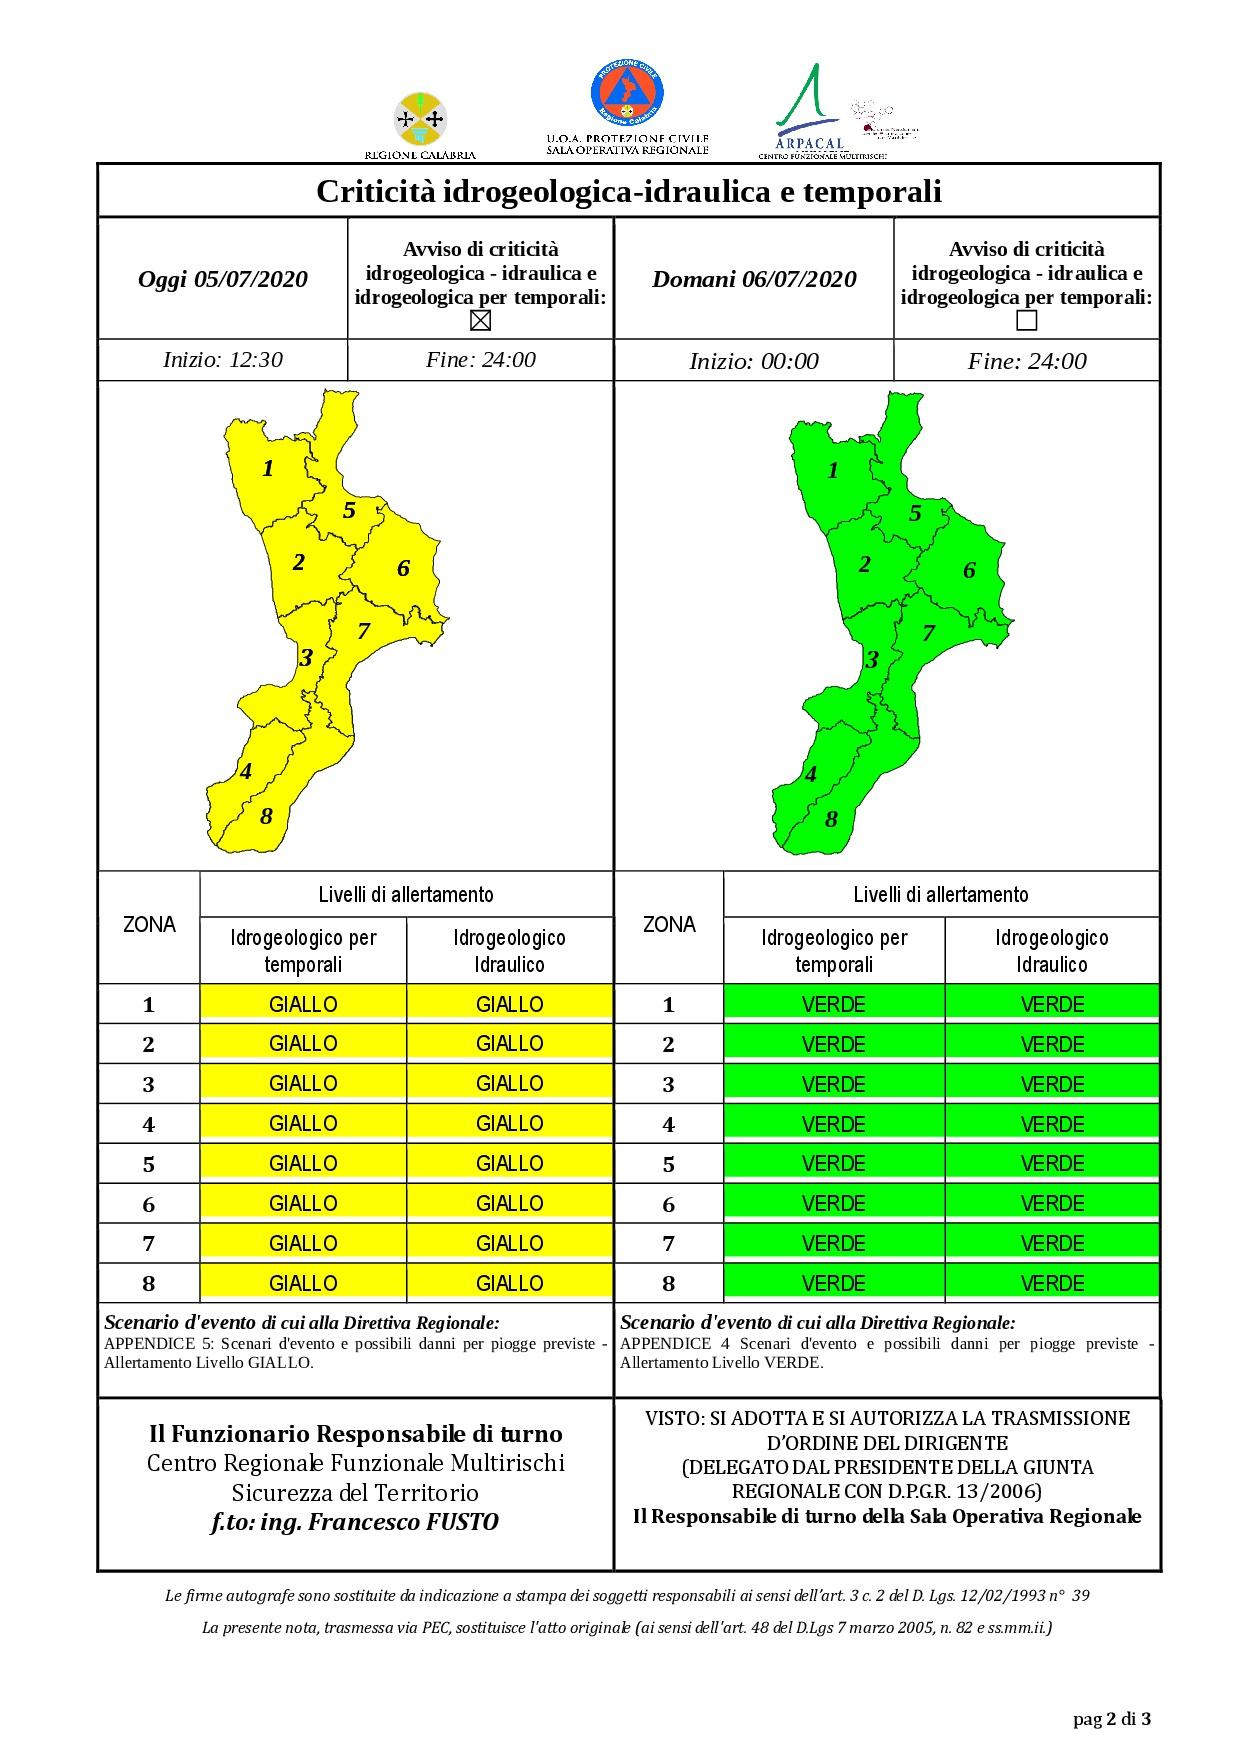 Criticità idrogeologica-idraulica e temporali in Calabria 05-07-2020